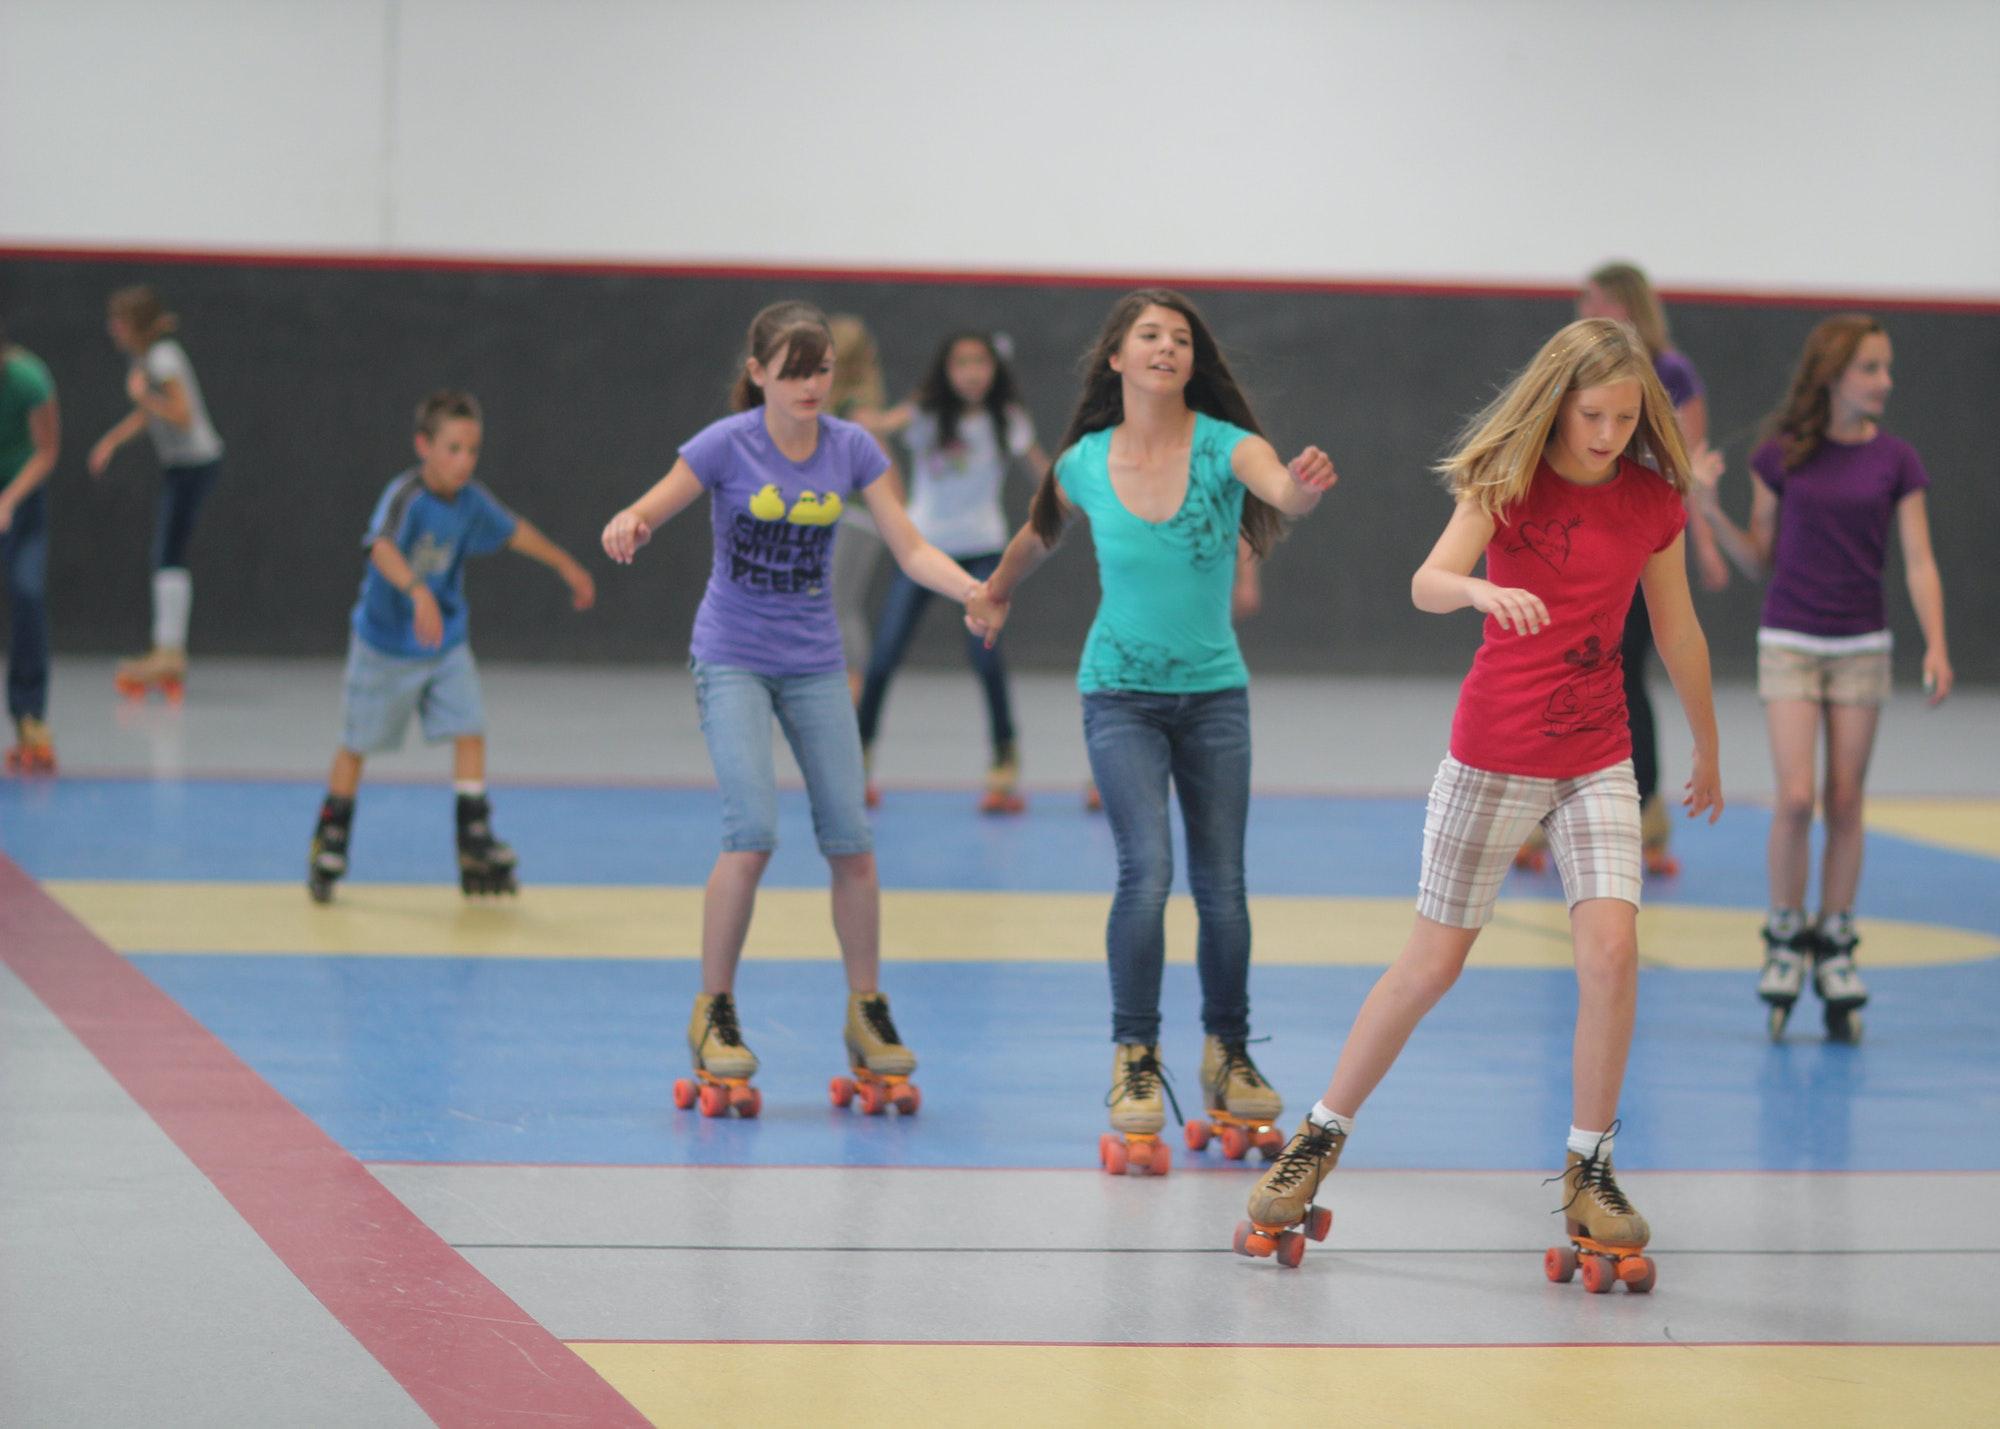 Kids skating at the power play center